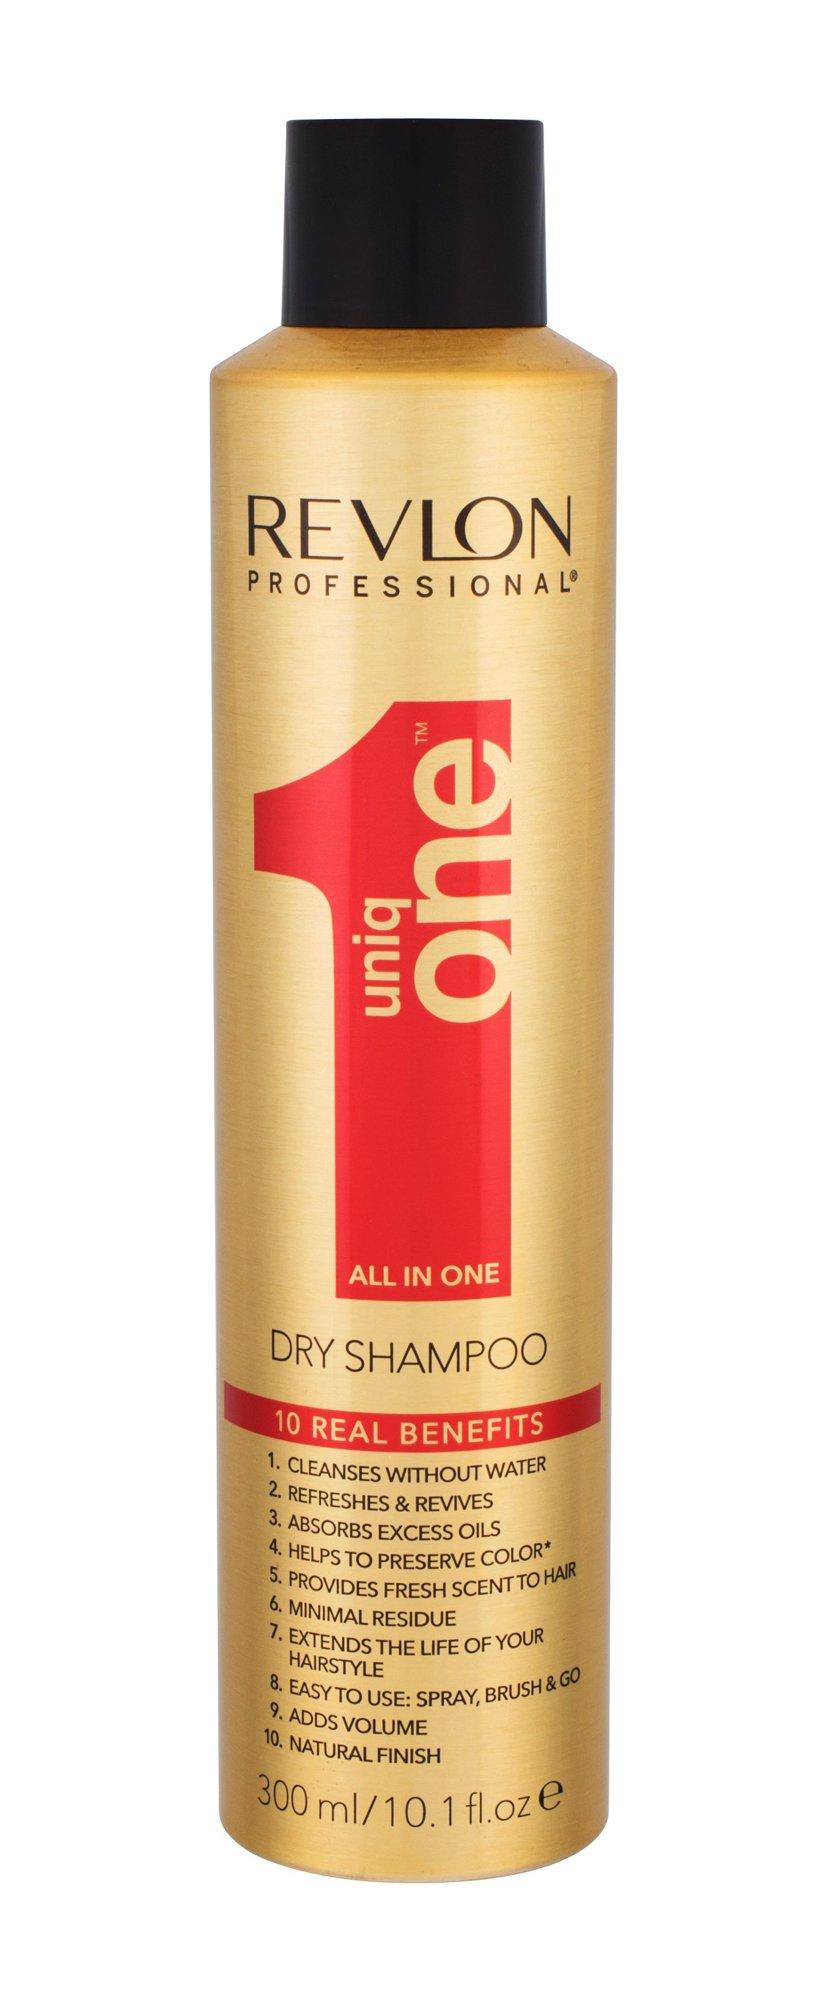 Revlon Professional Uniq One Dry Shampoo